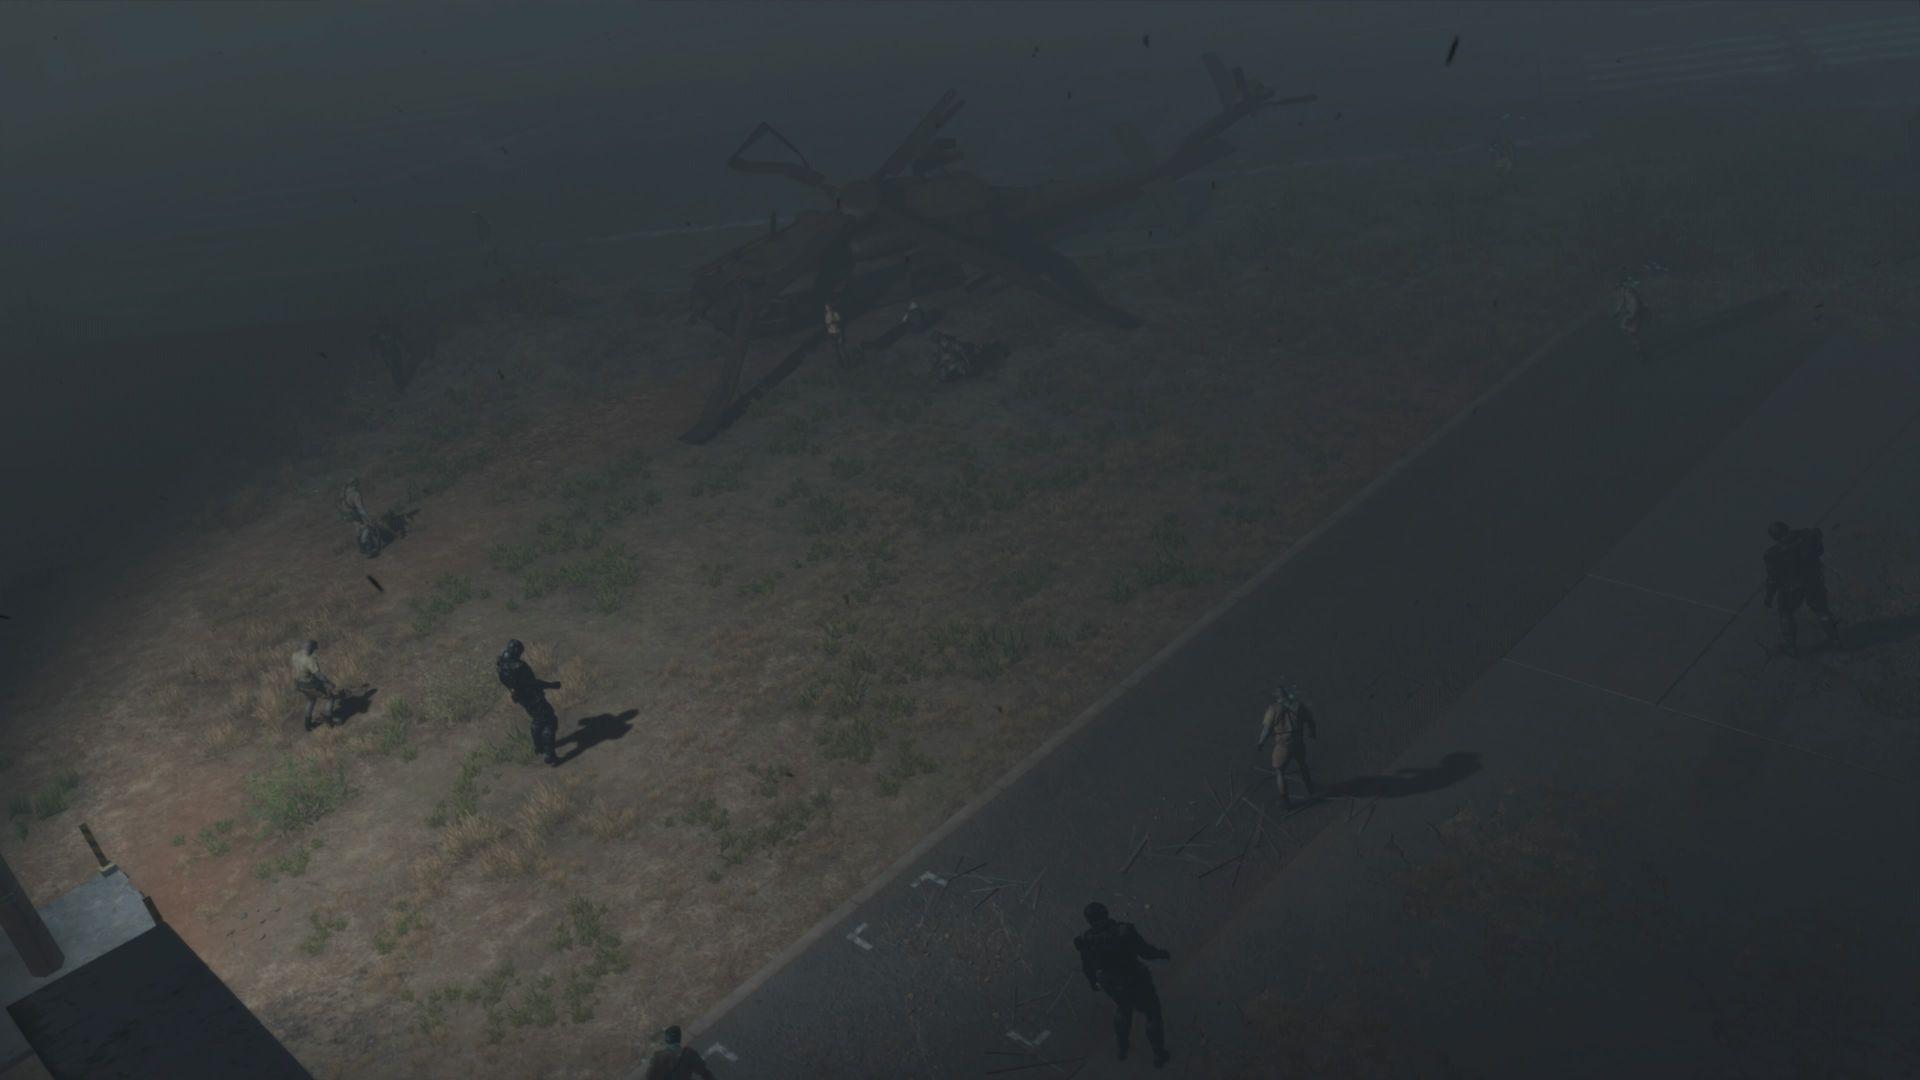 Metal Gear Solid V arena missione 29